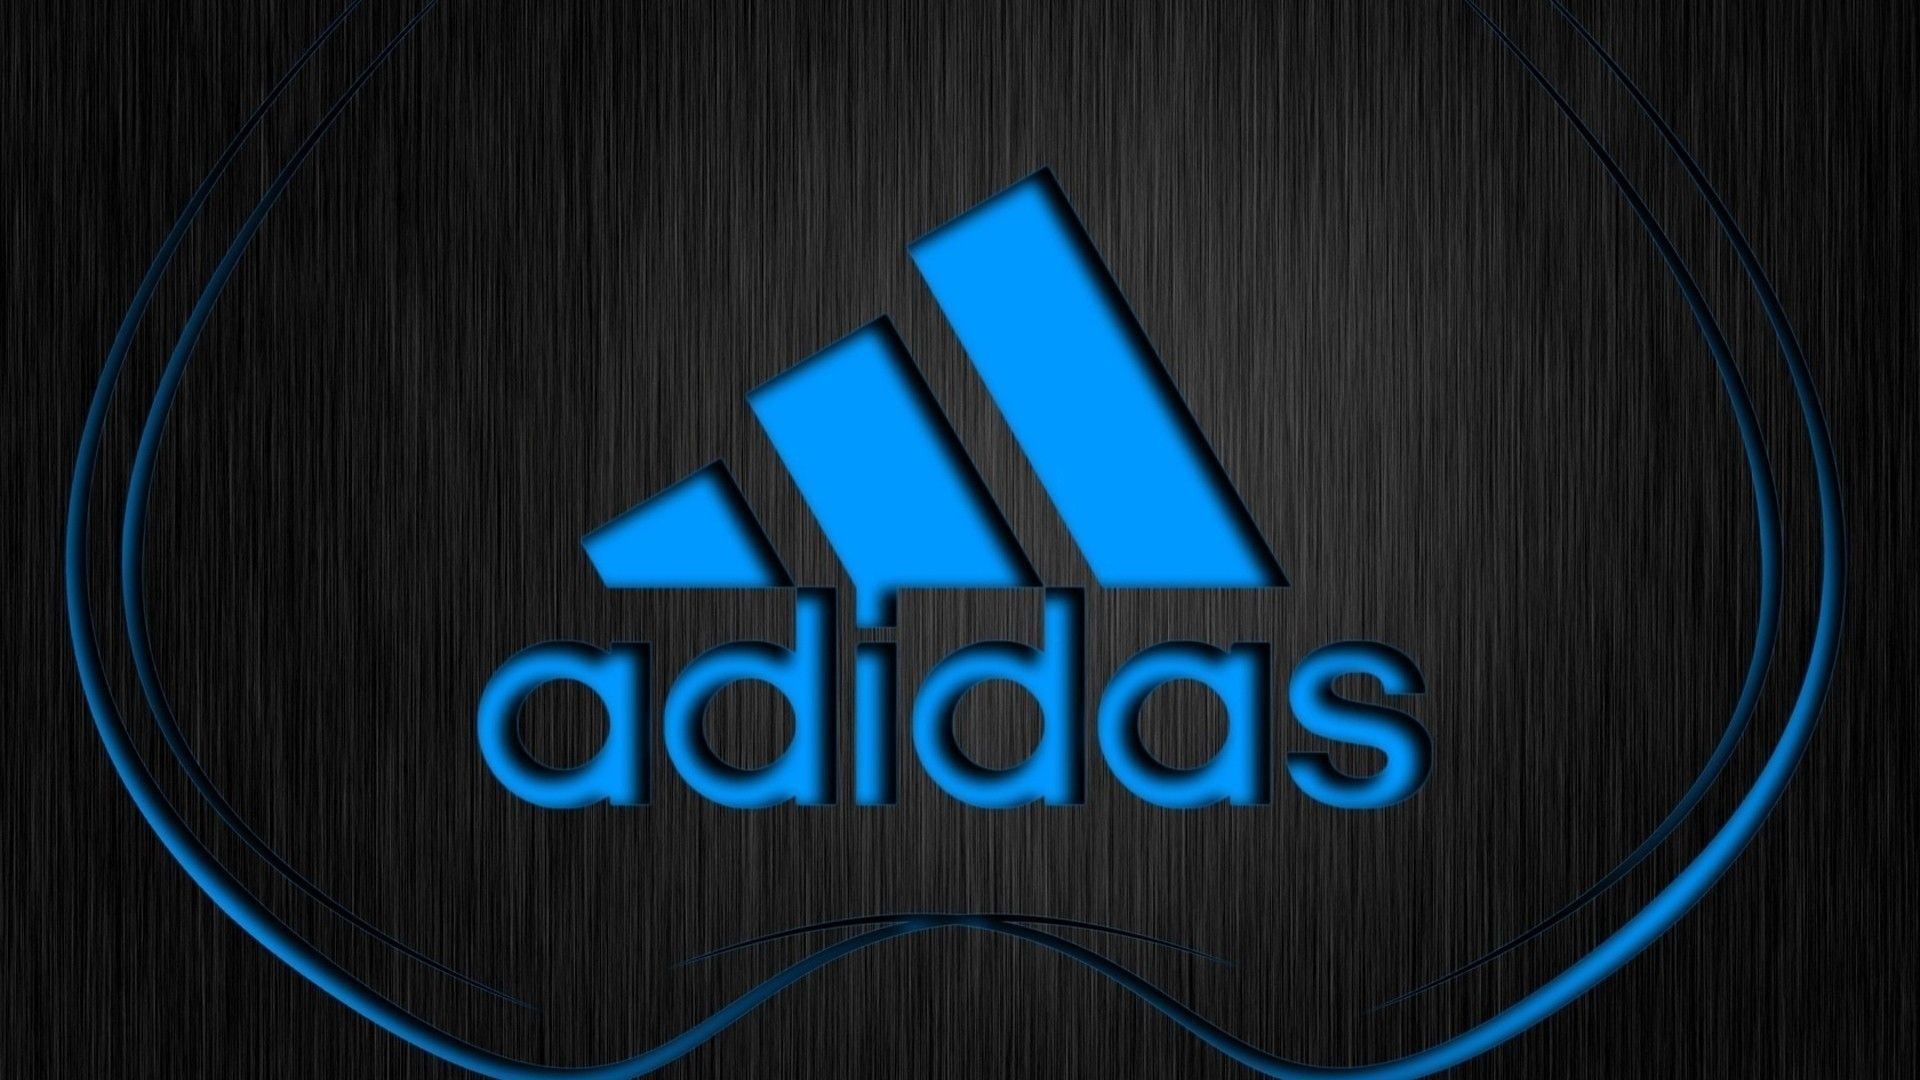 Wallpaper Adidas Originals Logo